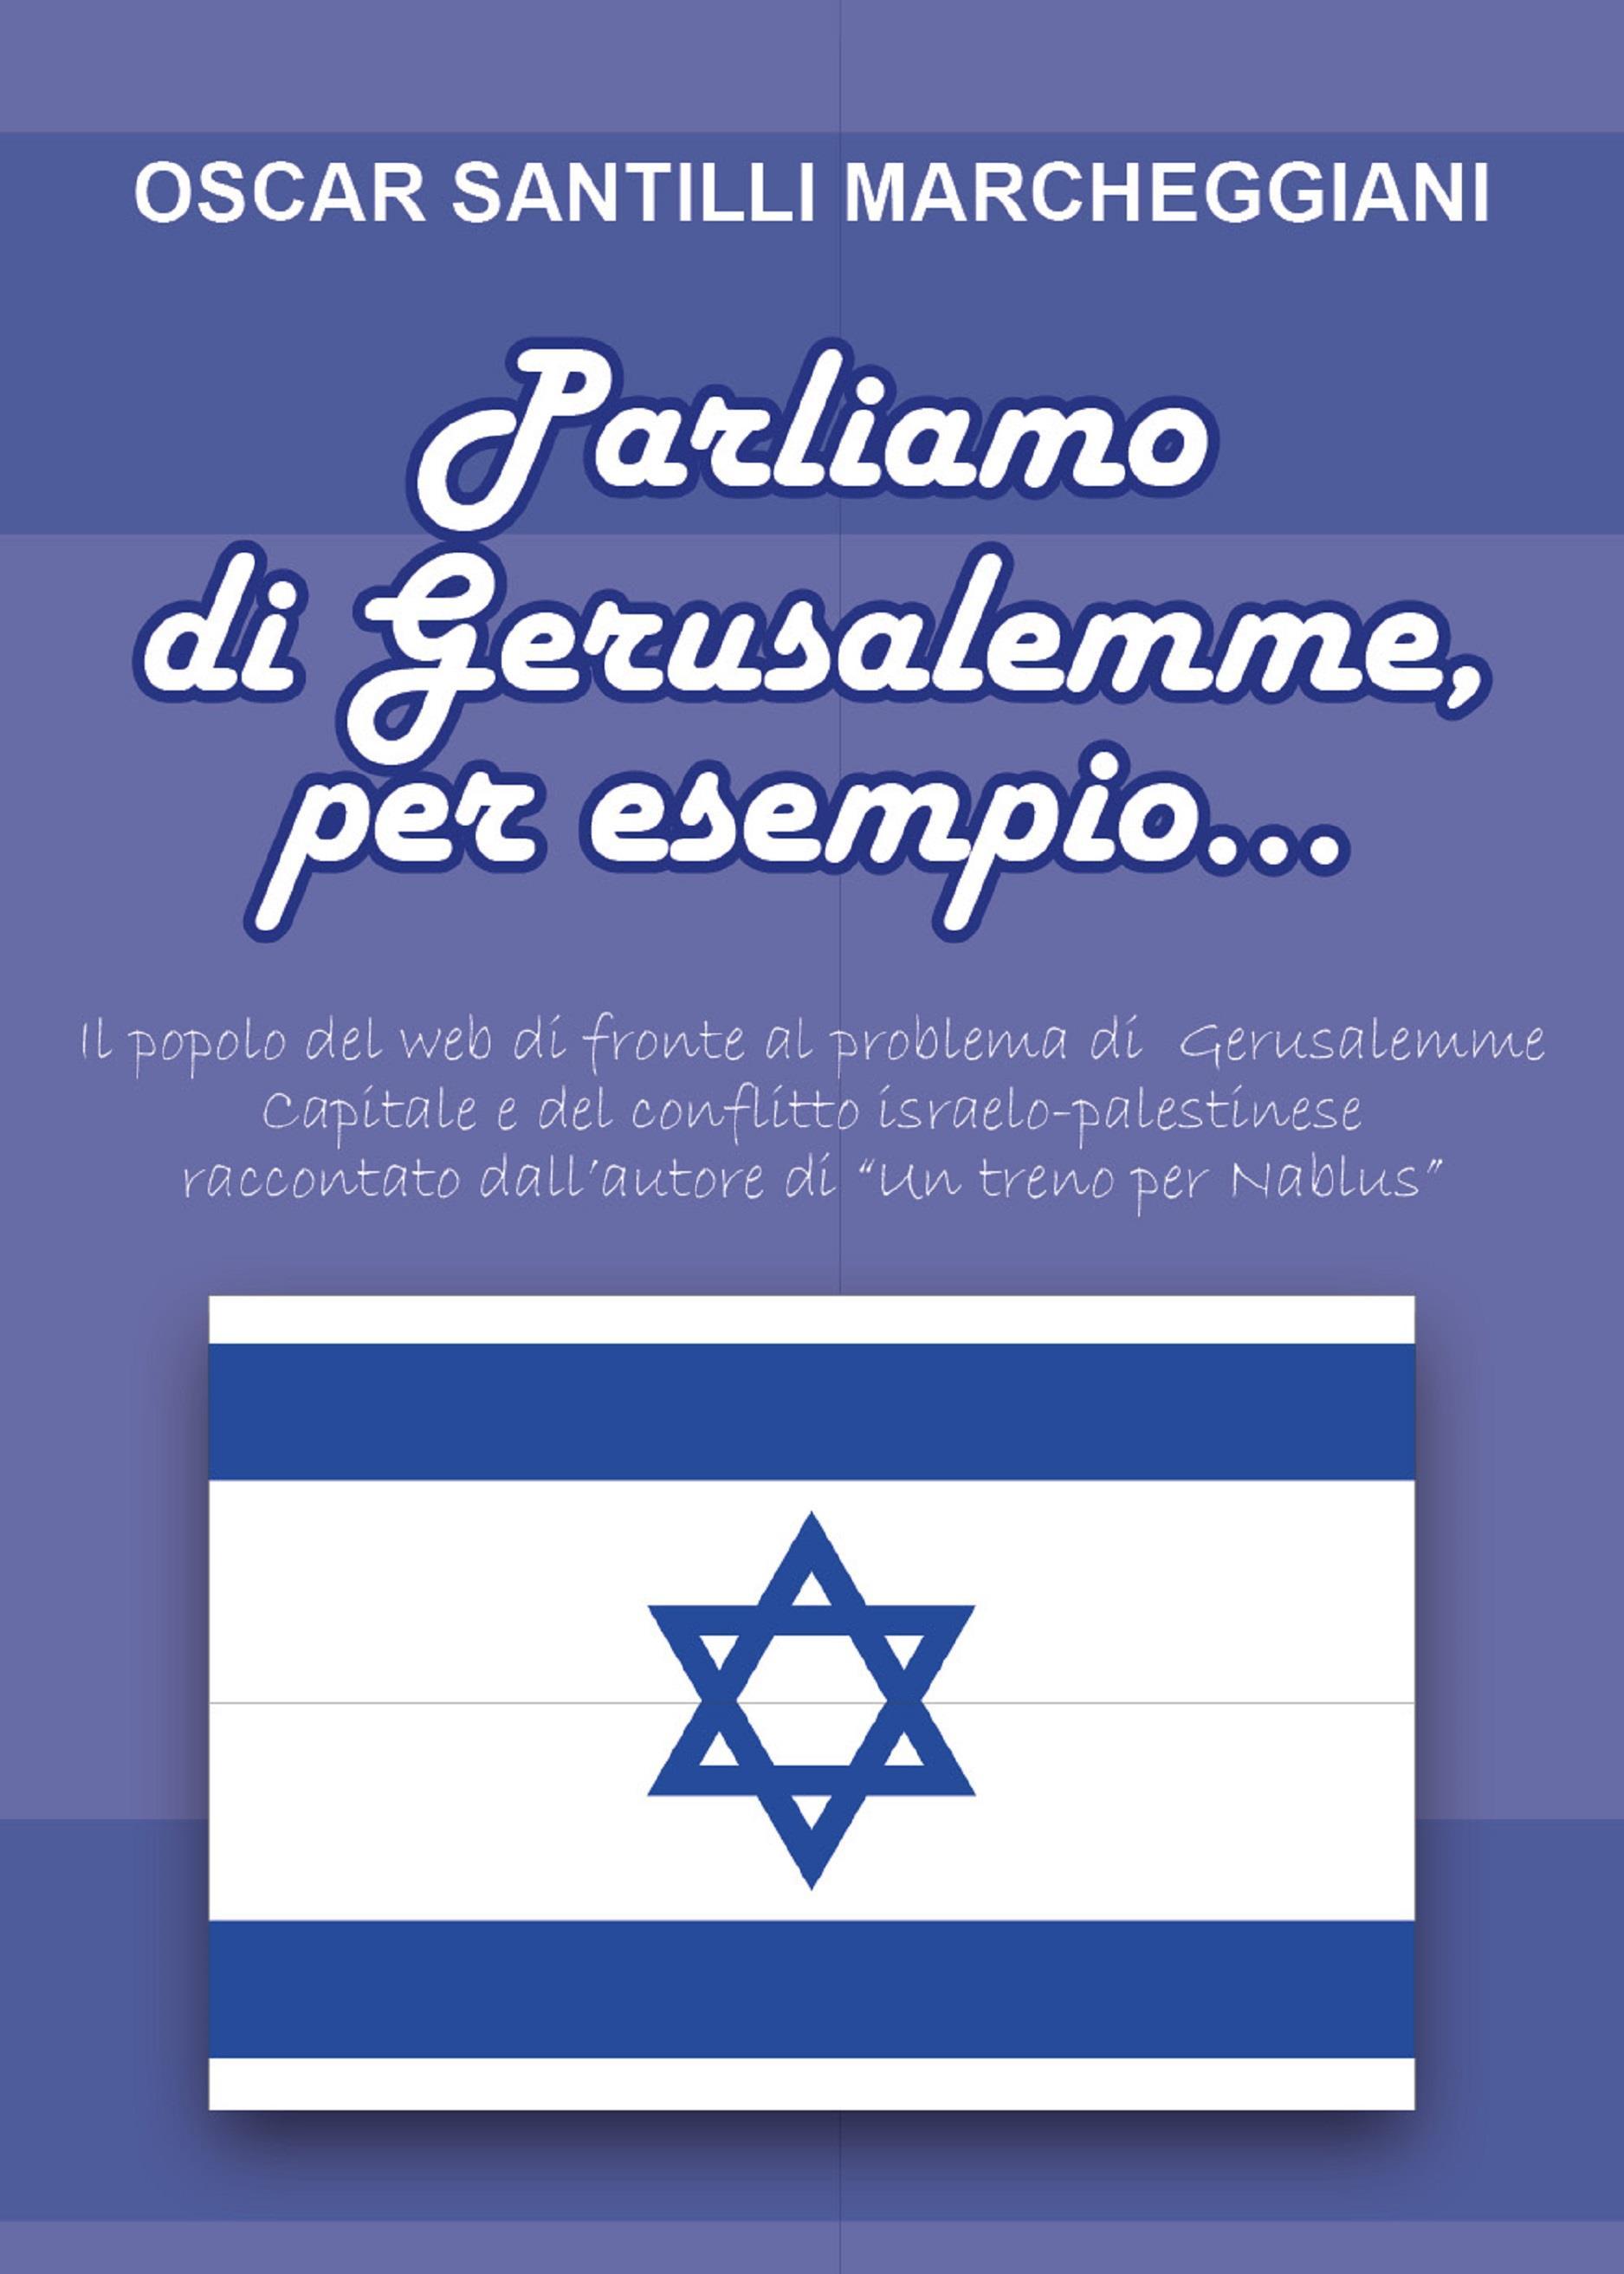 Parliamo di Gerusalemme, per esempio